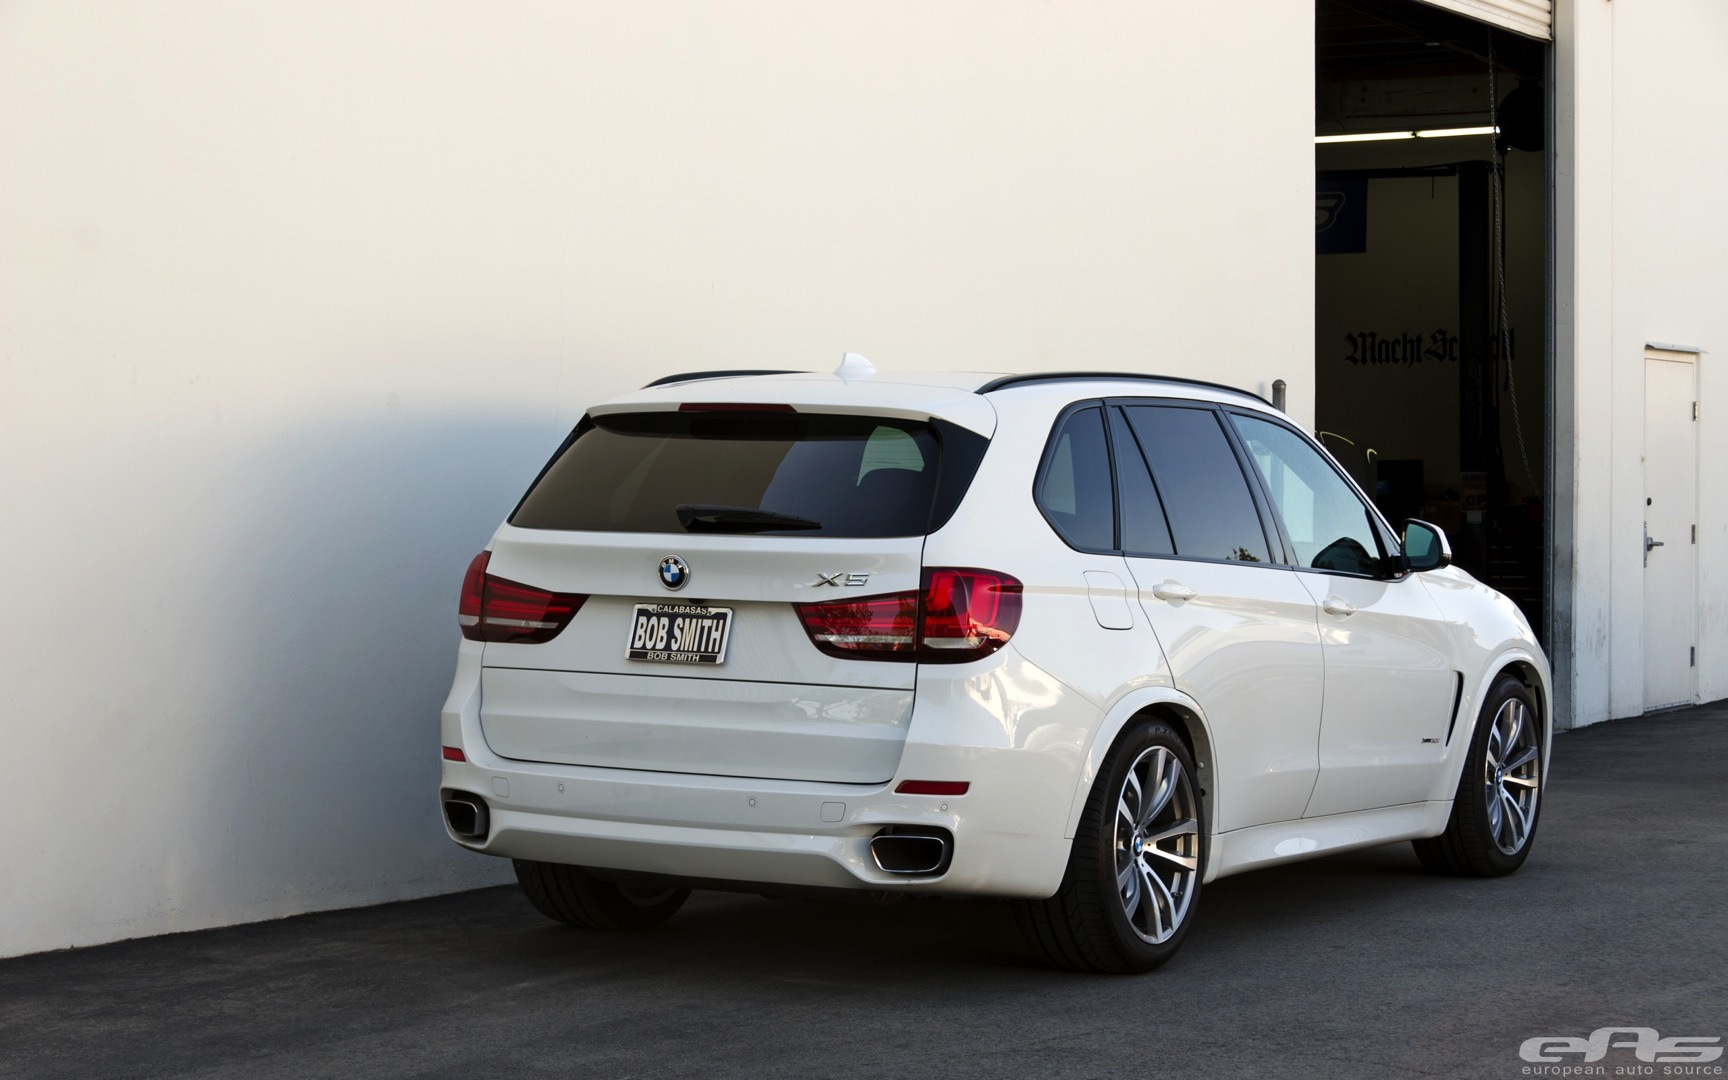 M Sport Bmw X5 Gets Low At Eas Autoevolution